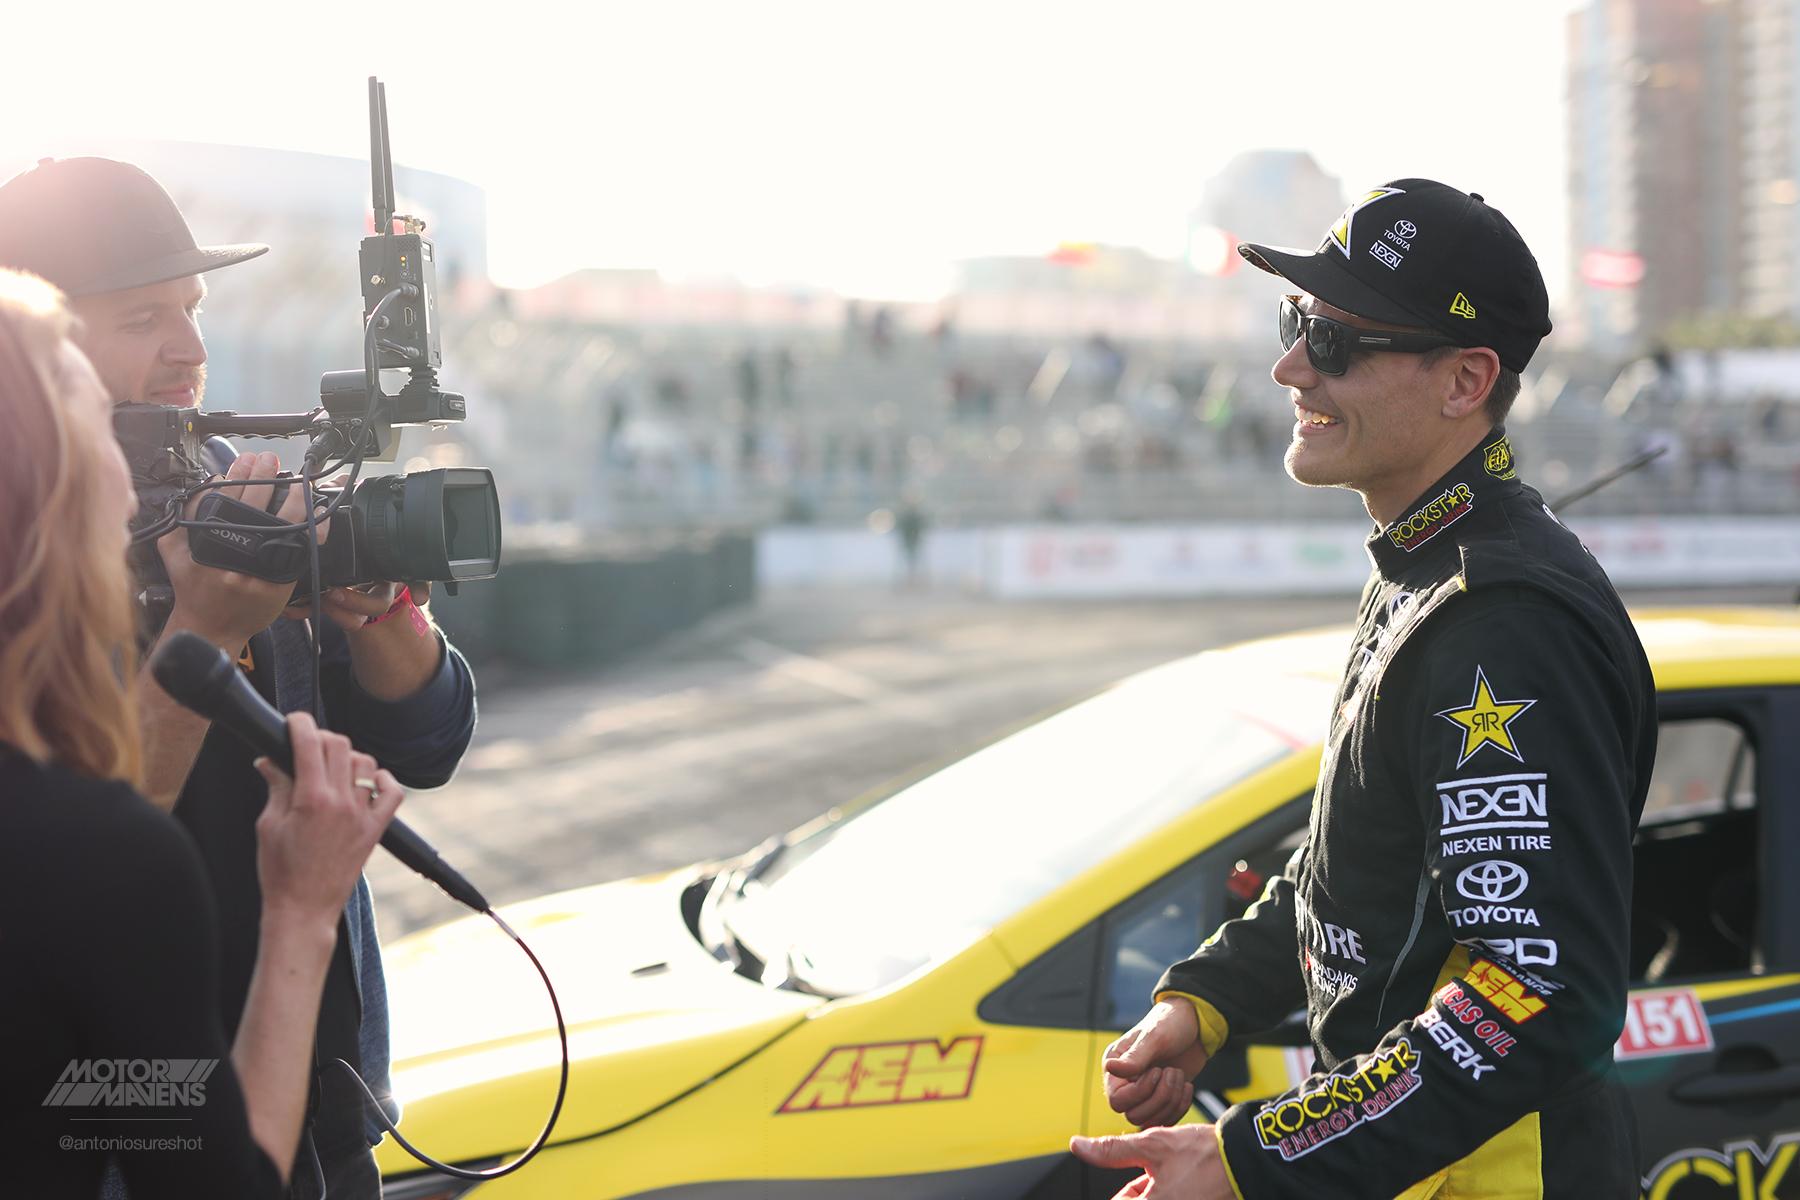 FDLB, TGPLB, GPLB, Formula Drift Long Beach, Fredric Aasbo, 2019 Corolla, Rockstar Energy, AEM Electronics, Motegi Racing, Nexen Tire